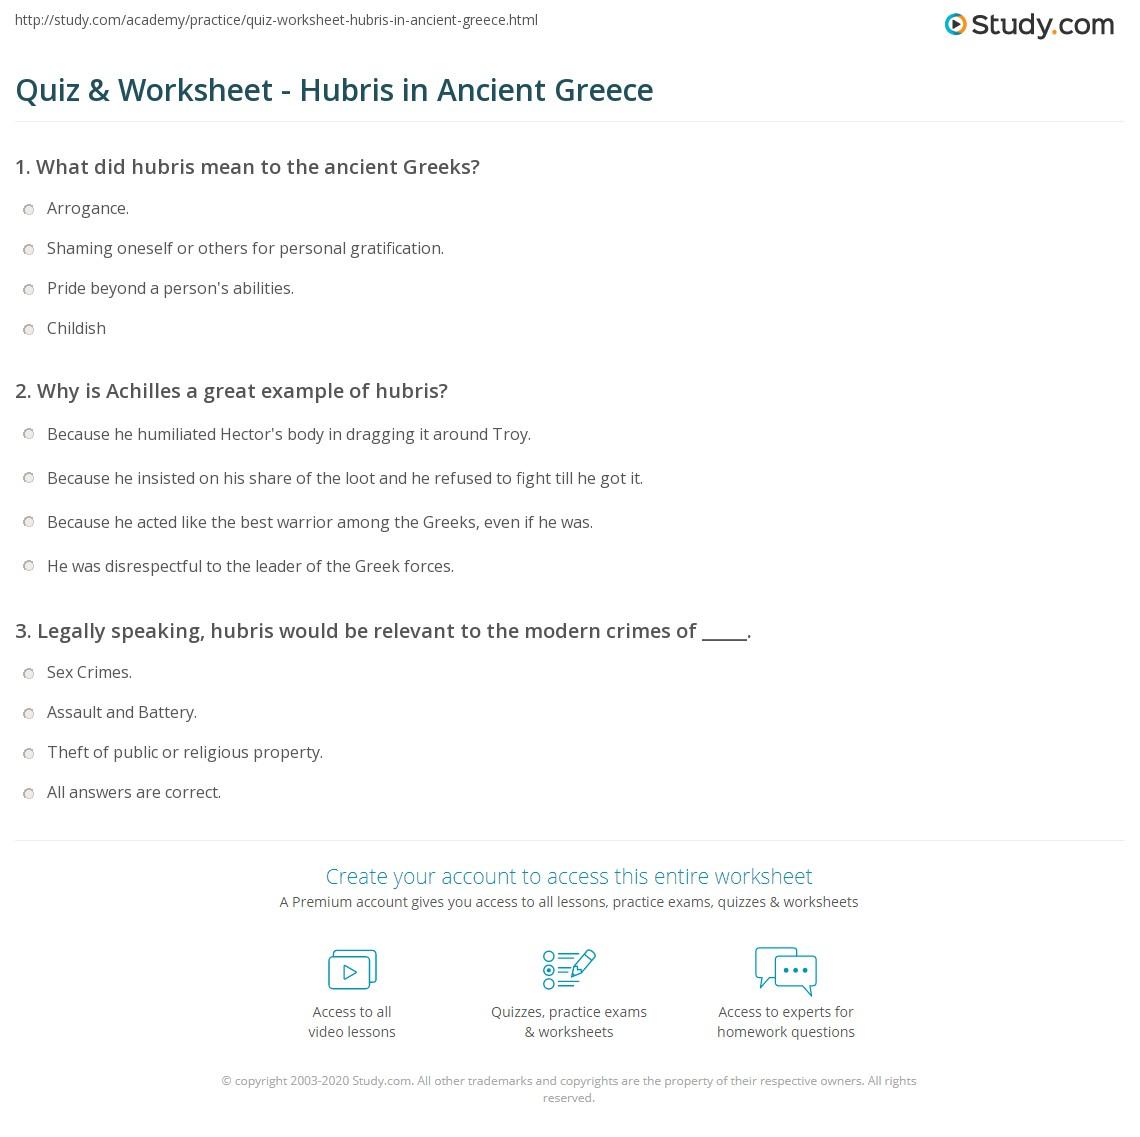 Quiz & Worksheet - Hubris in Ancient Greece | Study.com